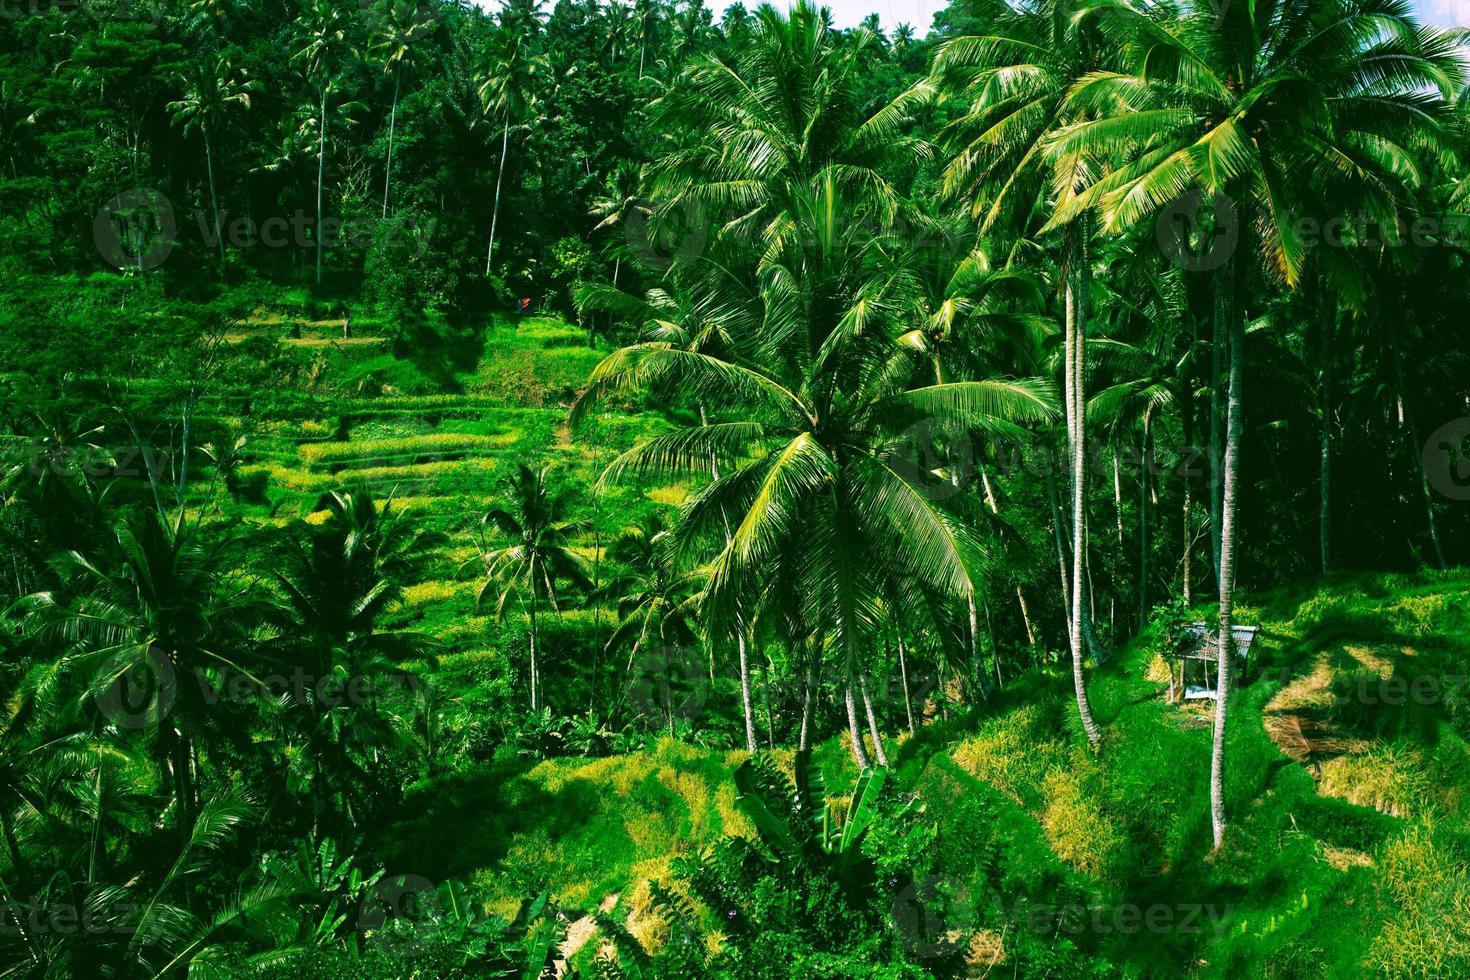 Tegalalang rice terrace in Bali island, Indonesia photo